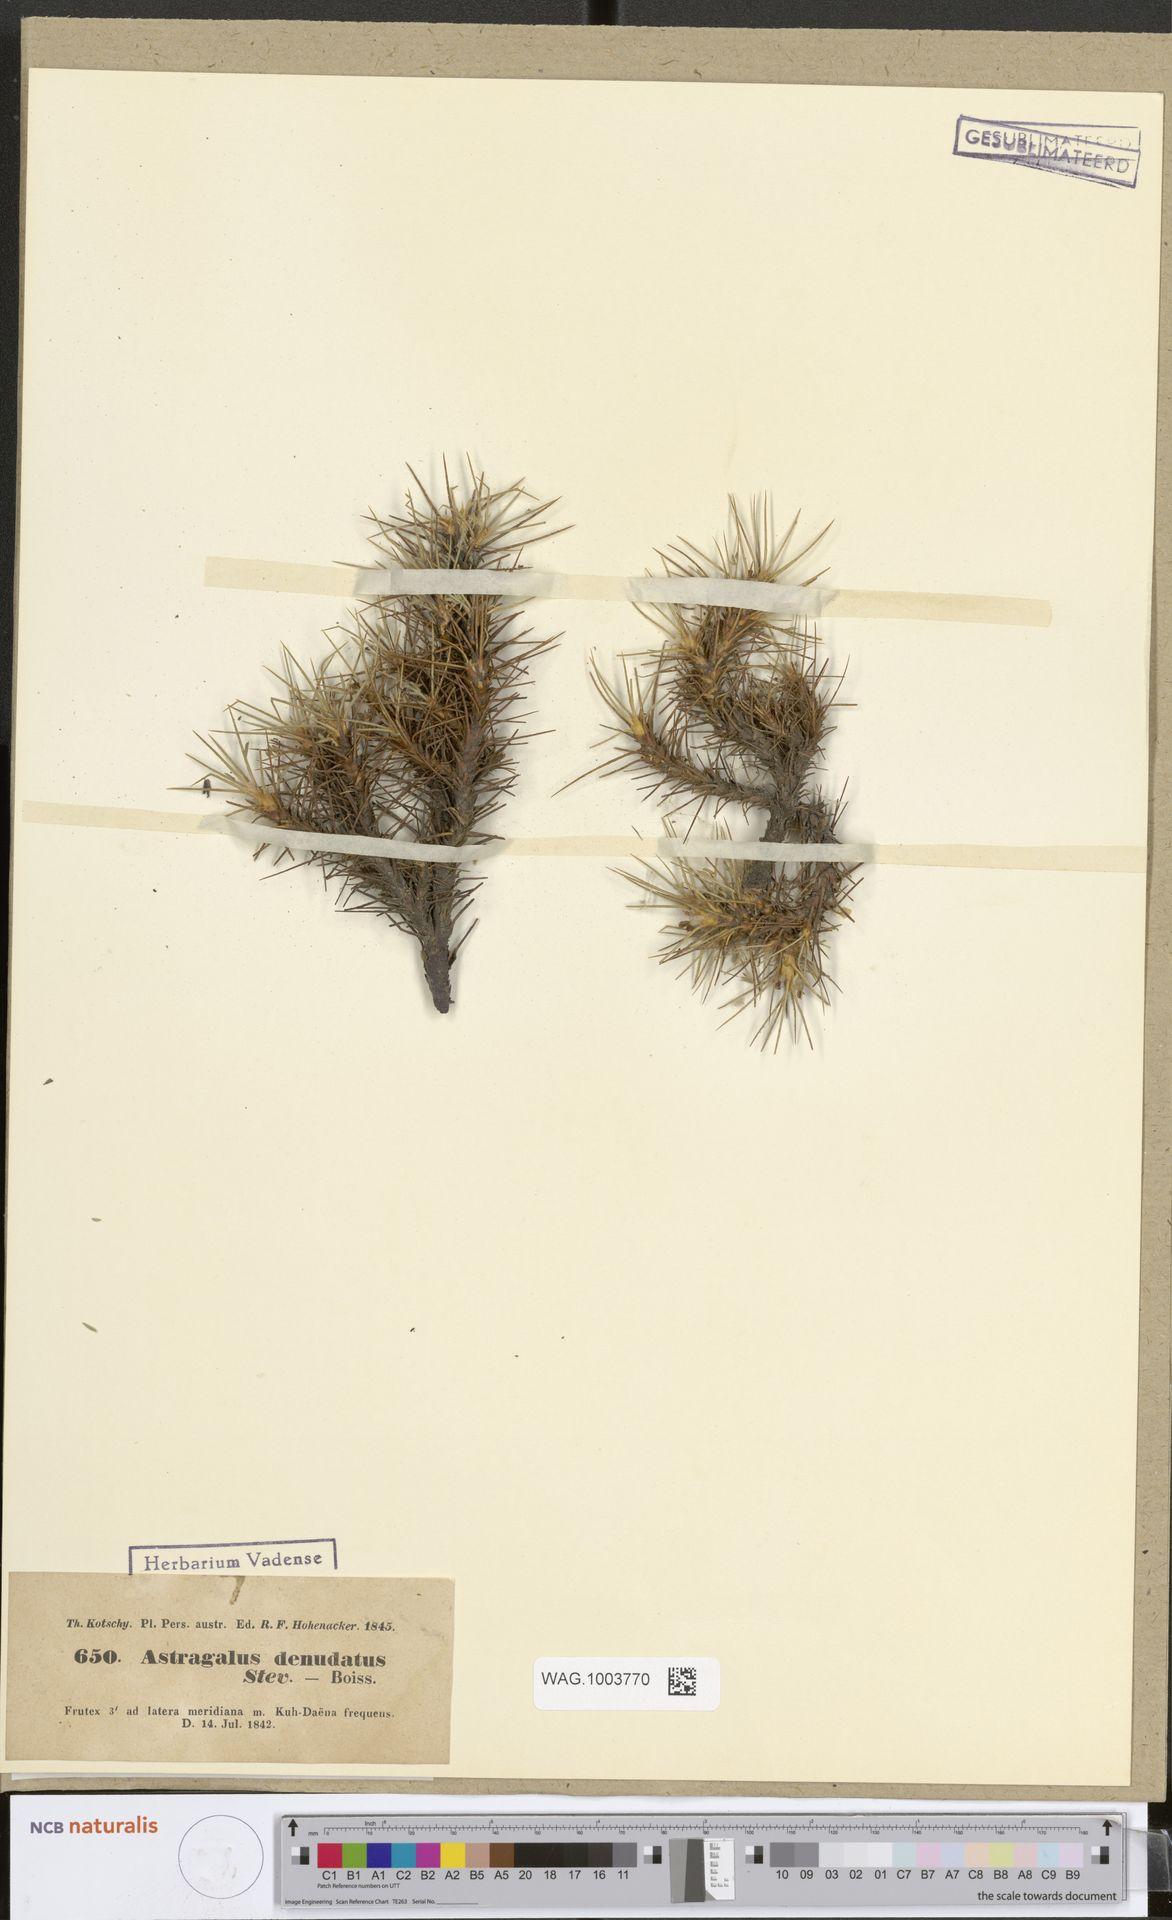 WAG.1003770   Astragalus denudatus Steven